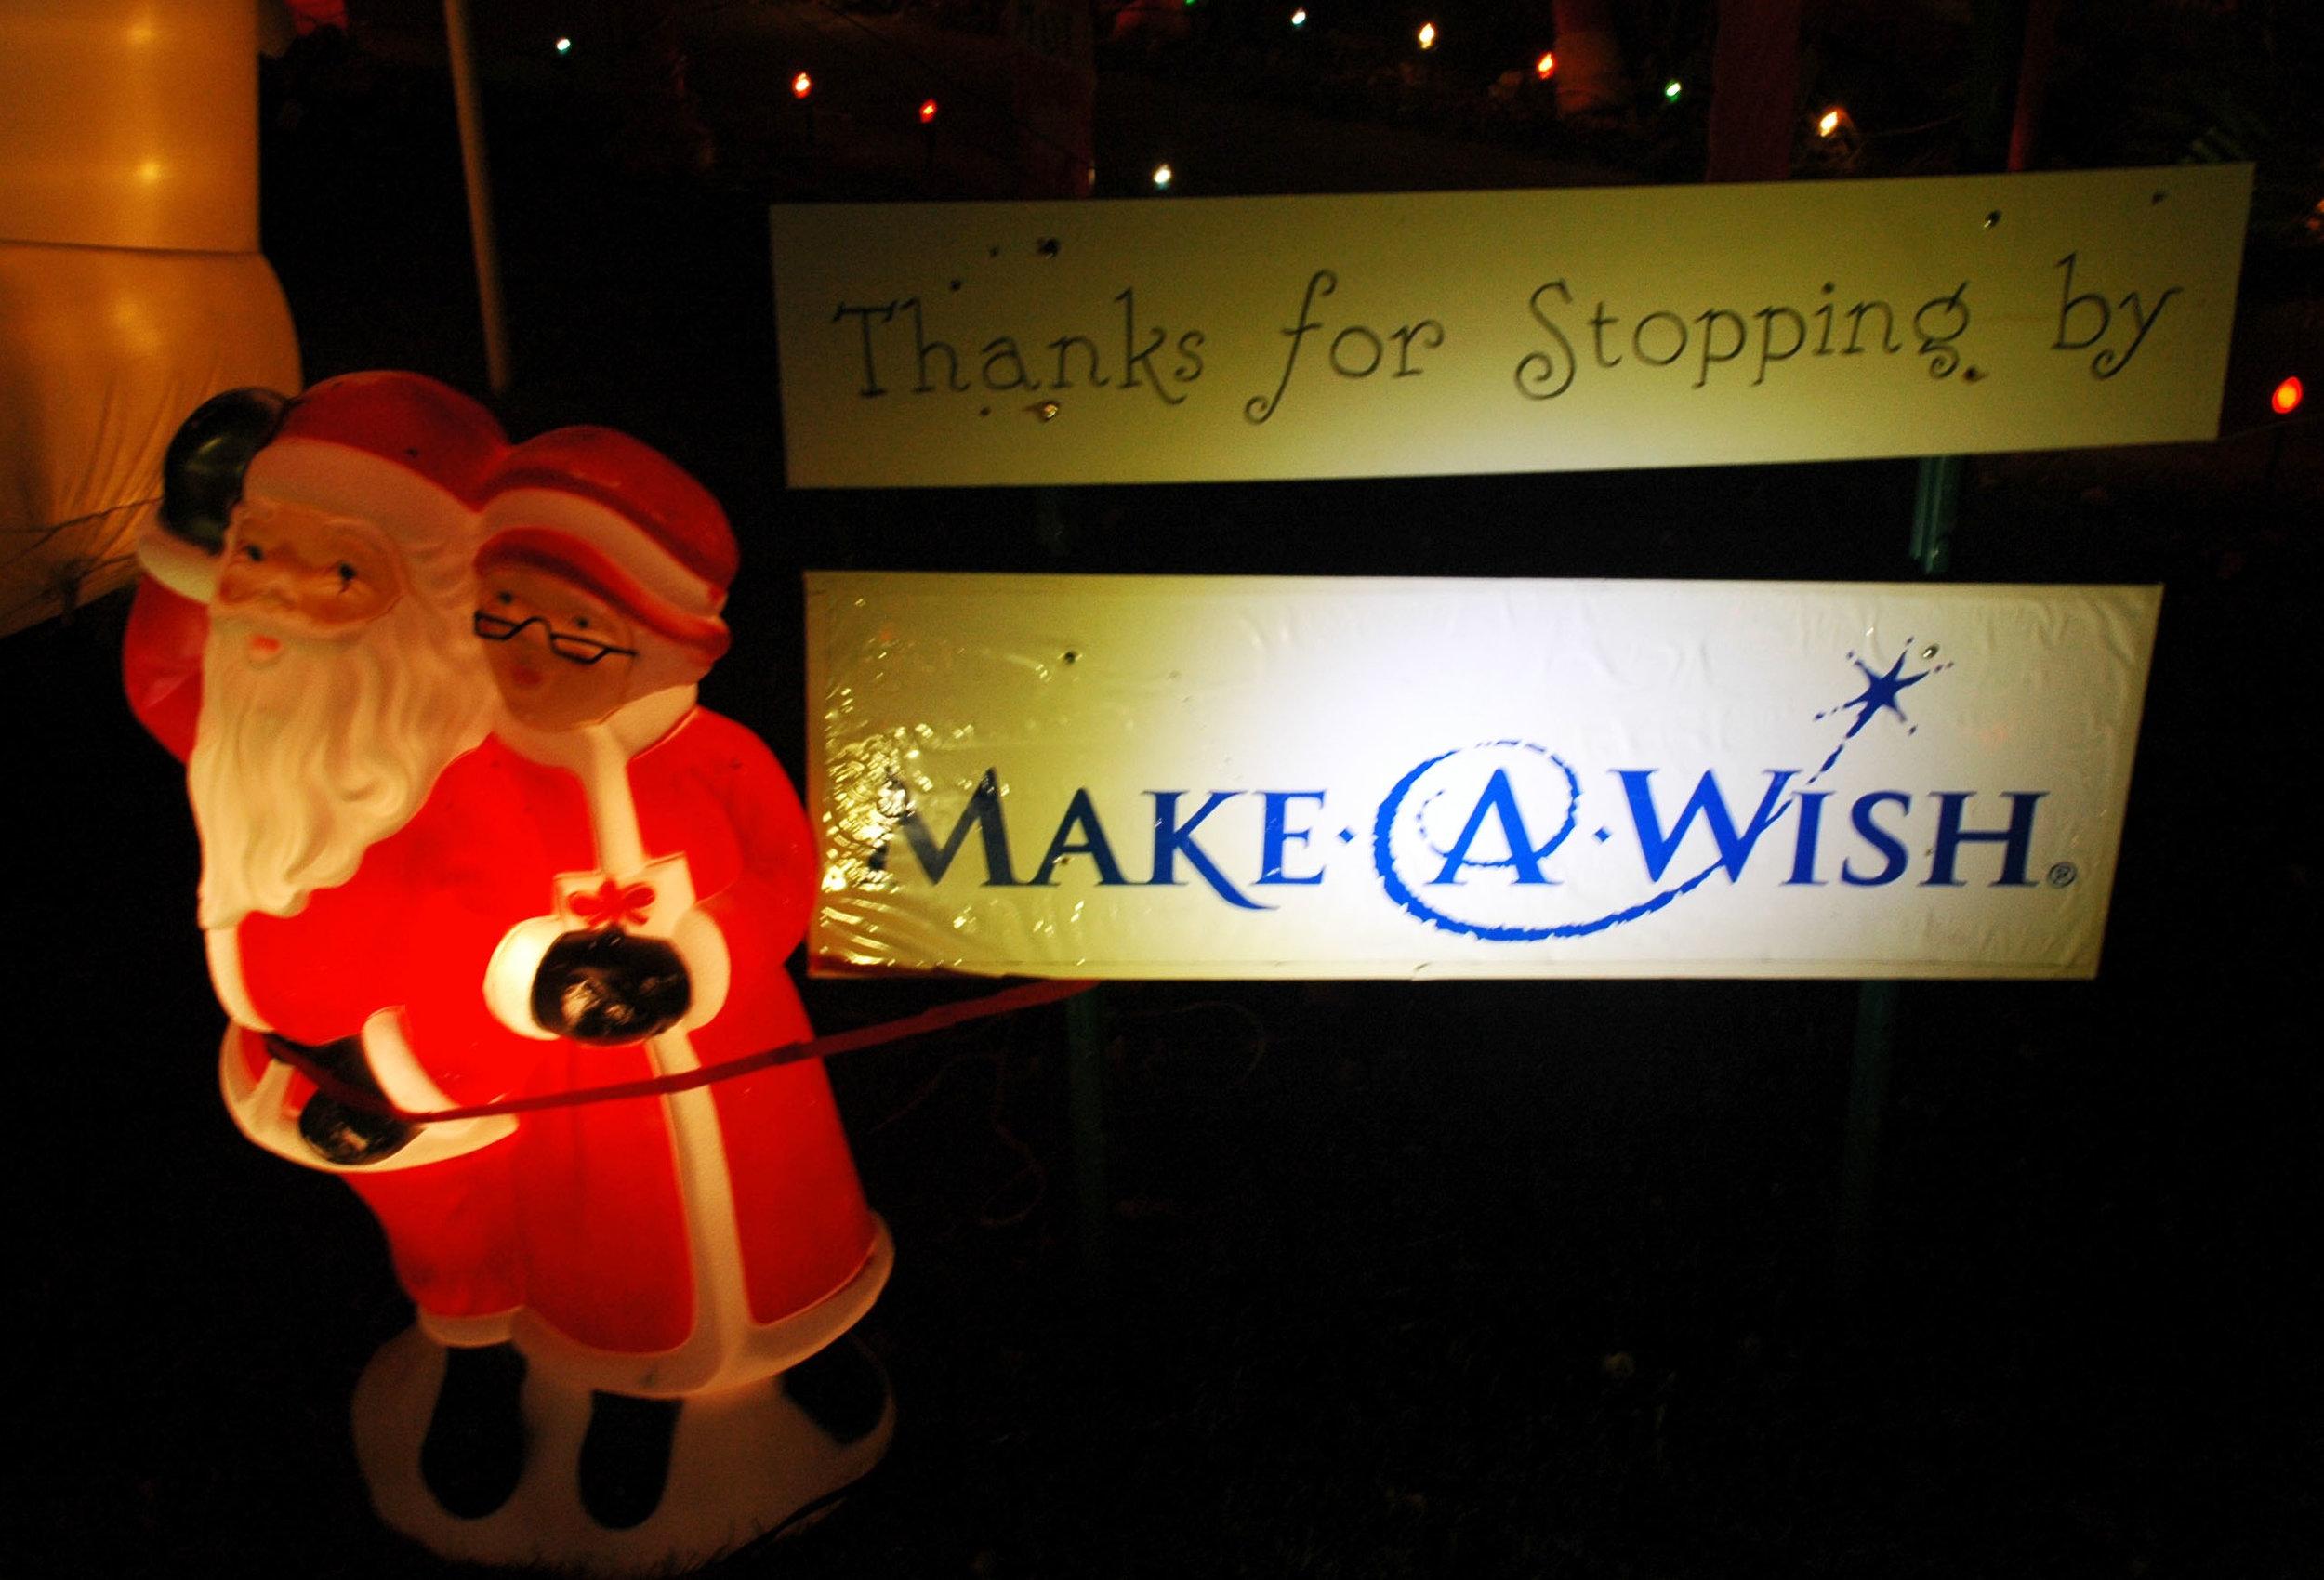 Donate to Make-a-Wish